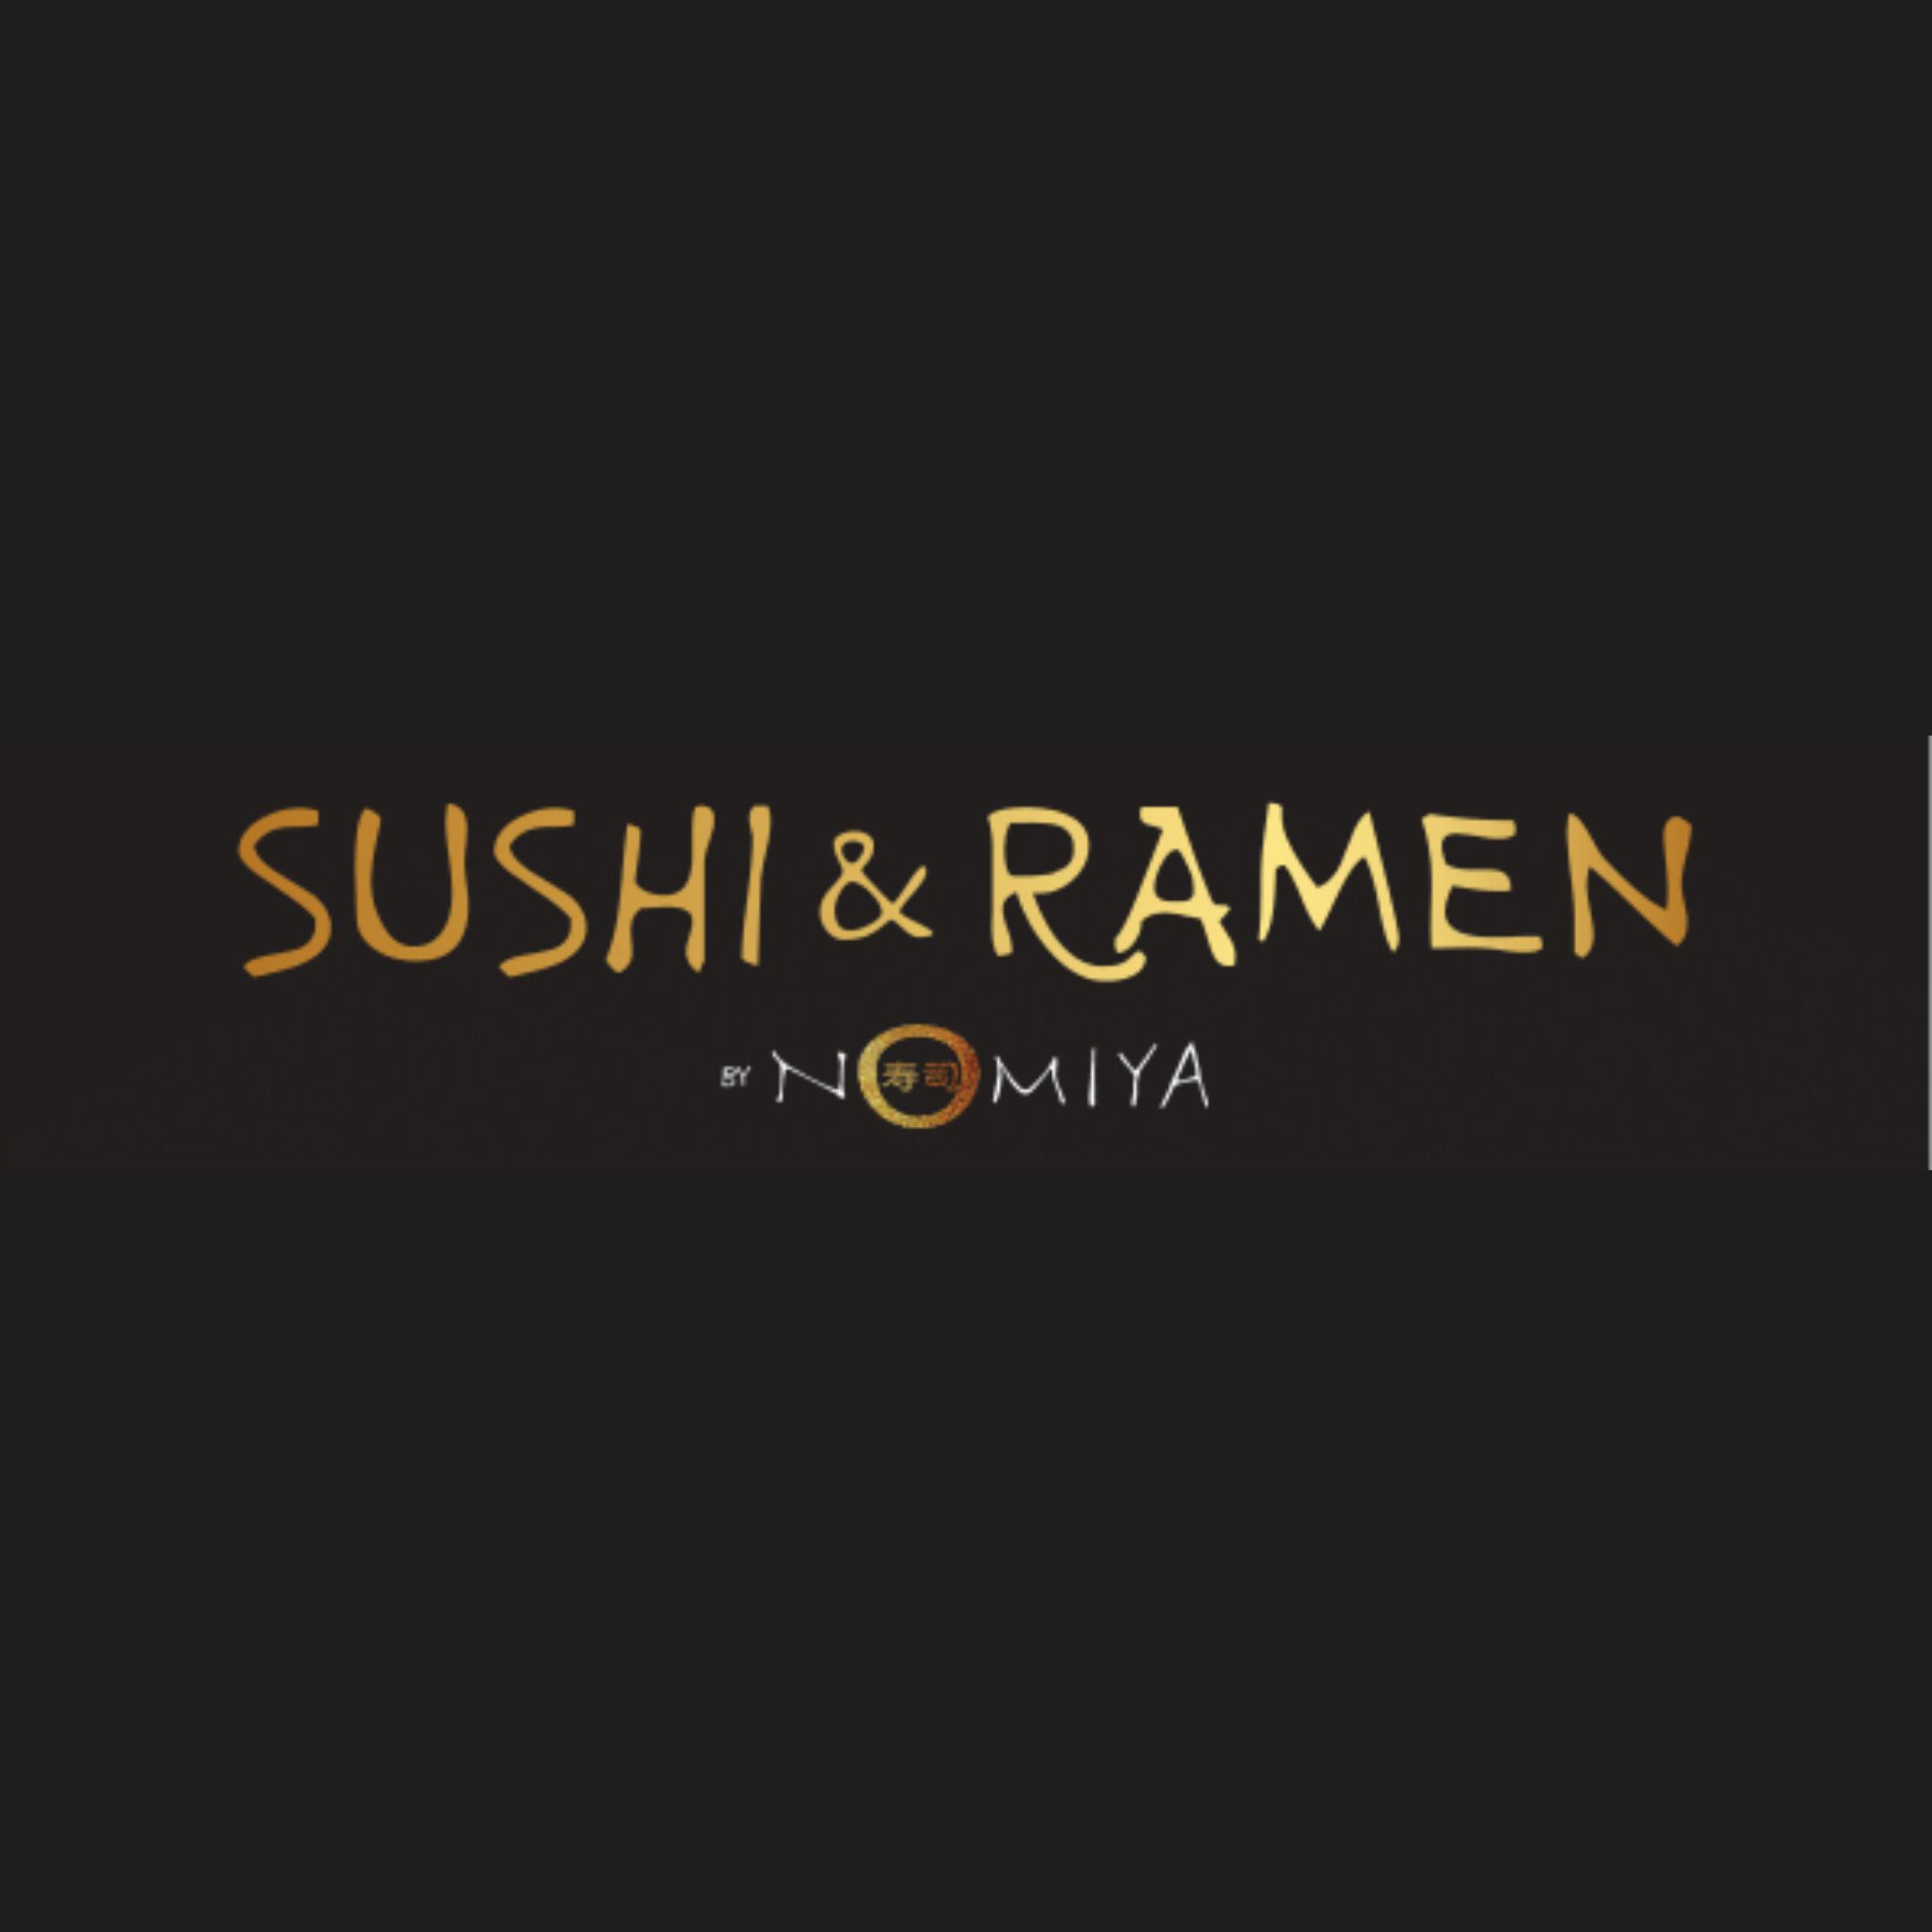 Sushi & Ramen by Nomiya